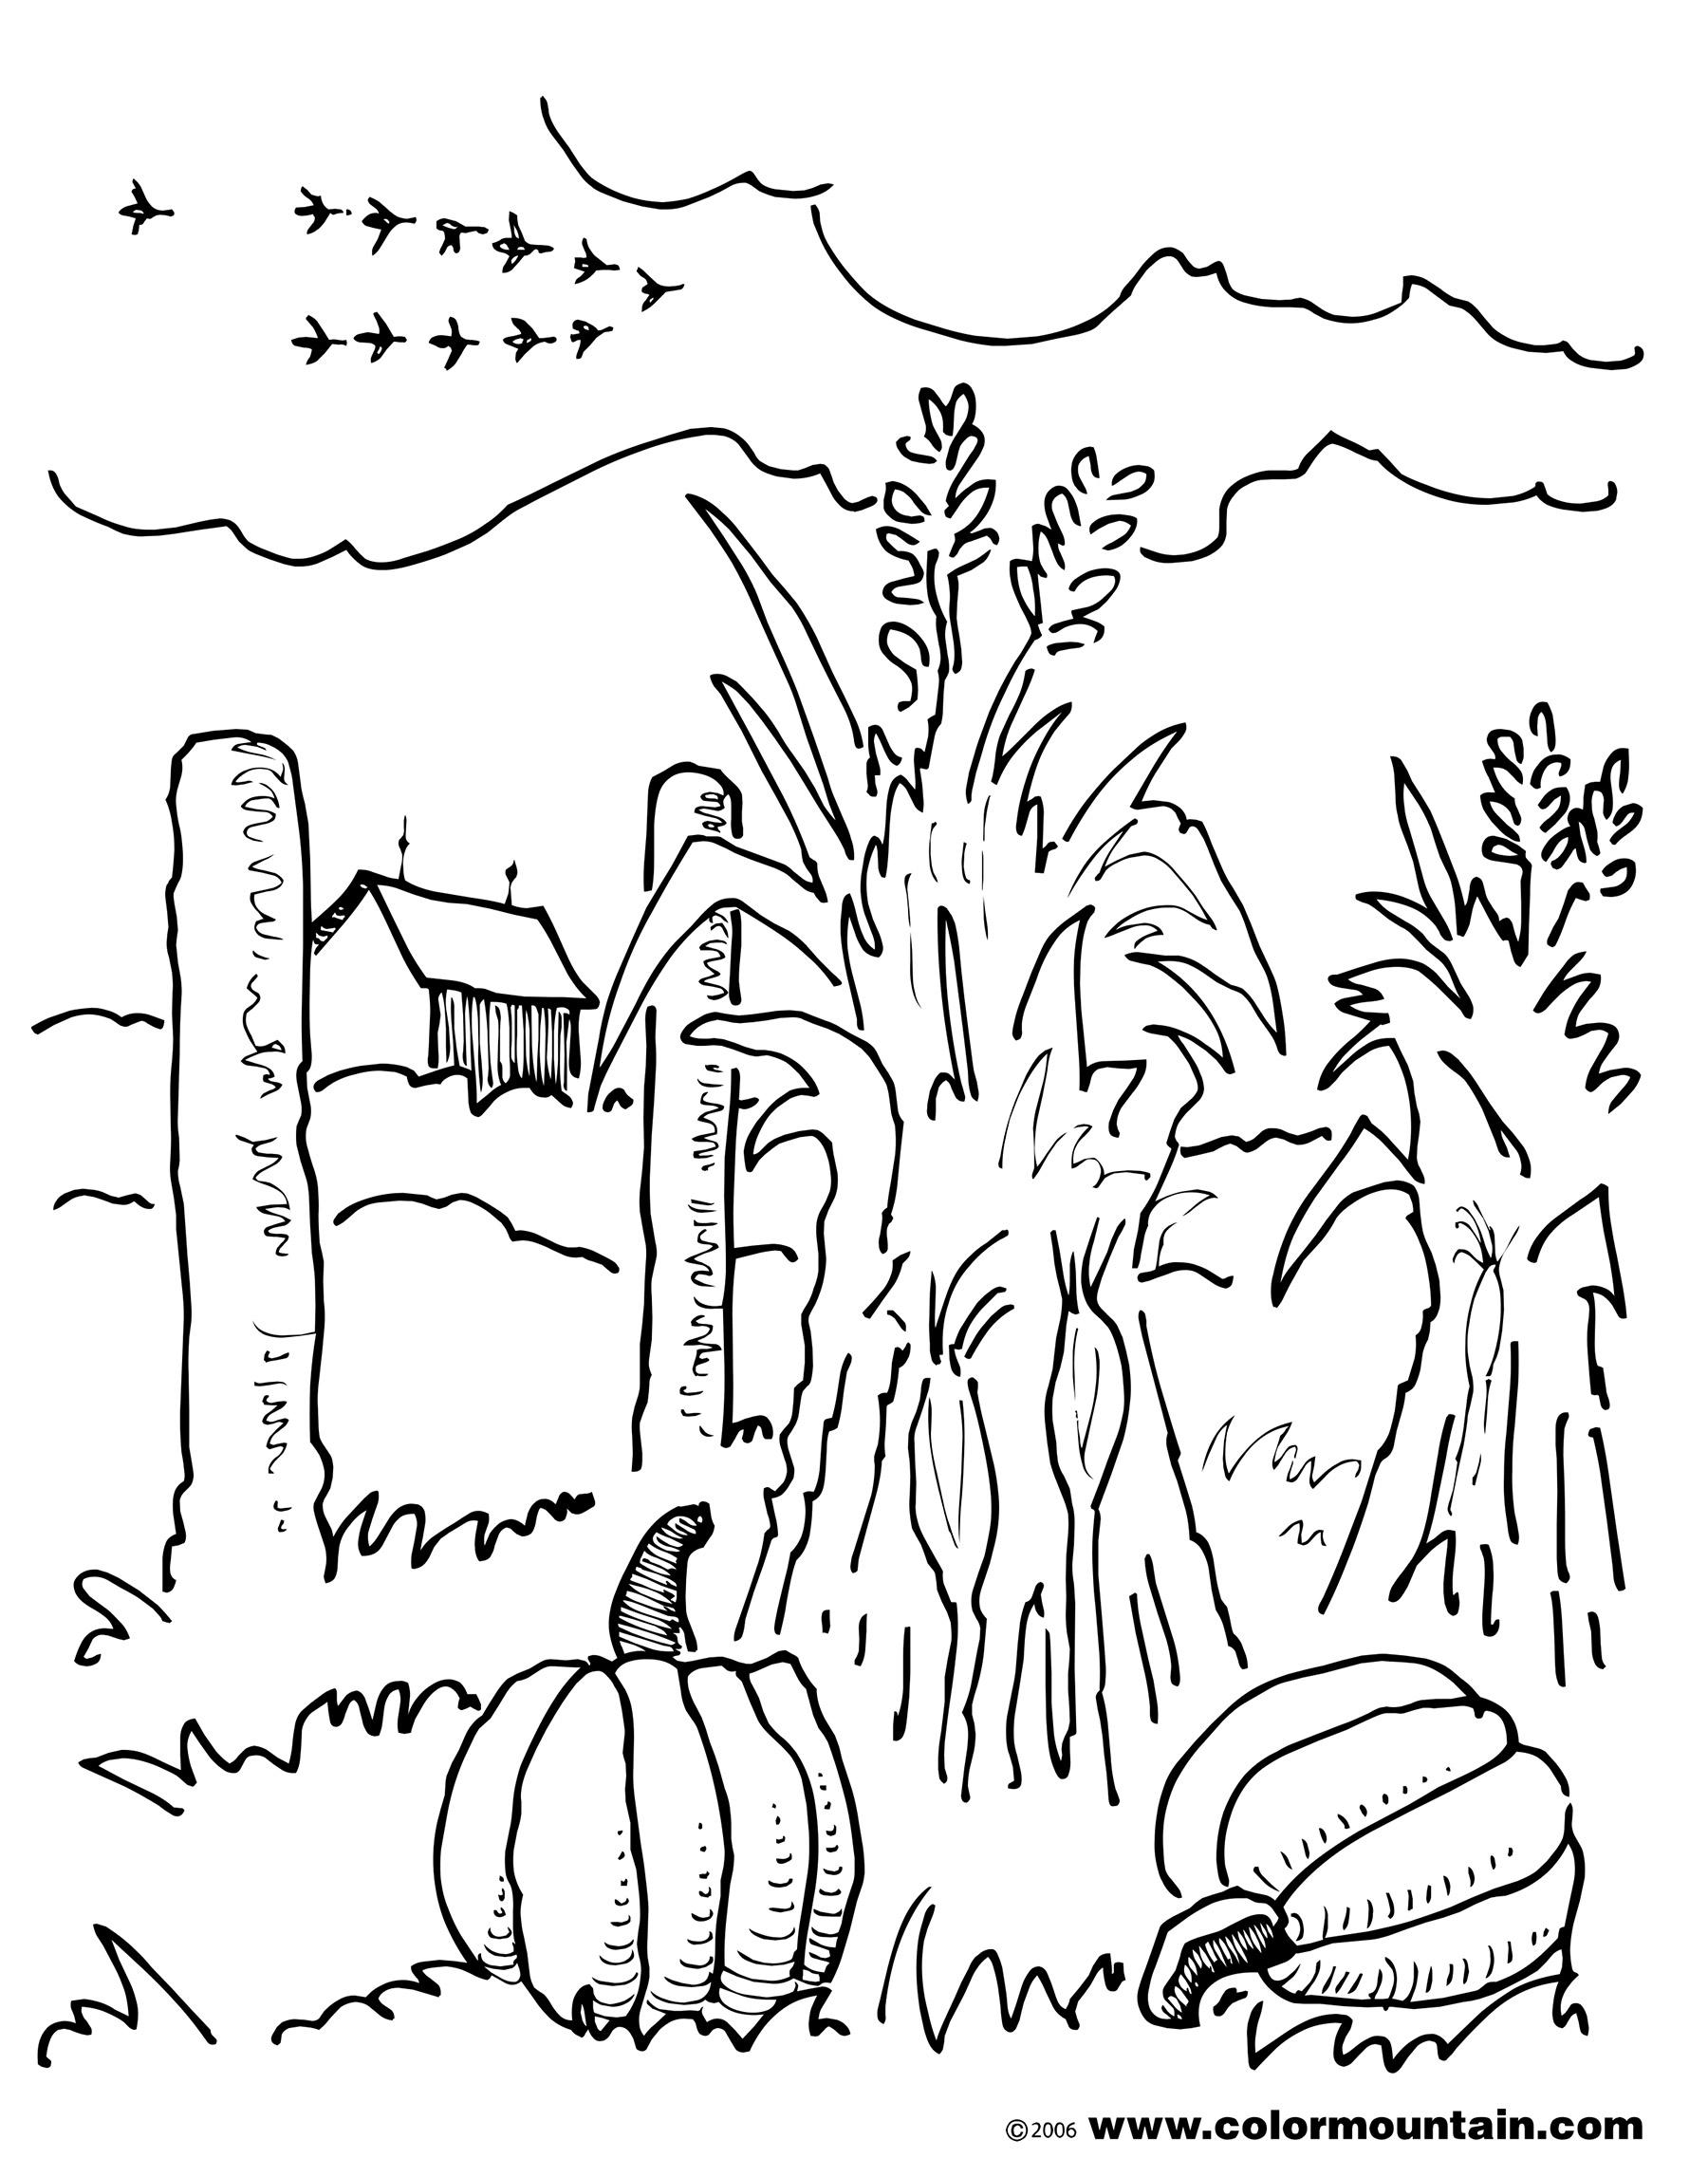 Corn Stalks Drawing At Getdrawings